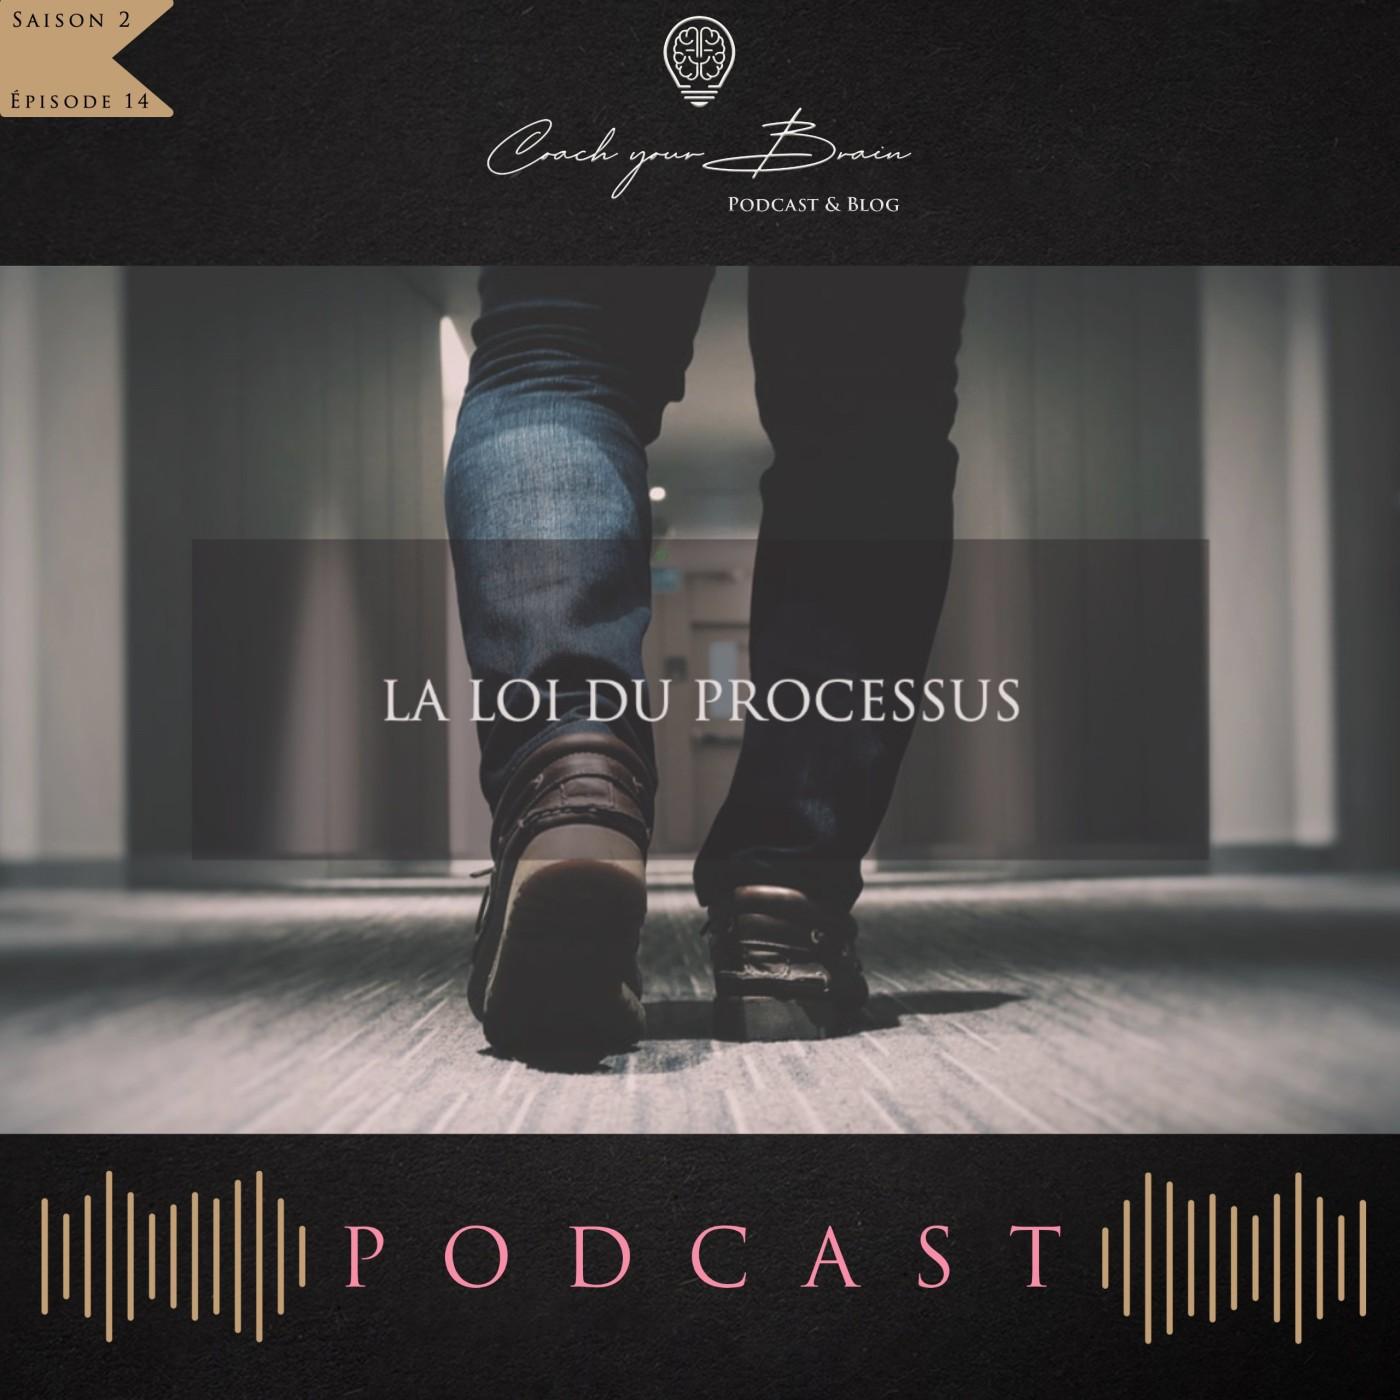 La loi du processus